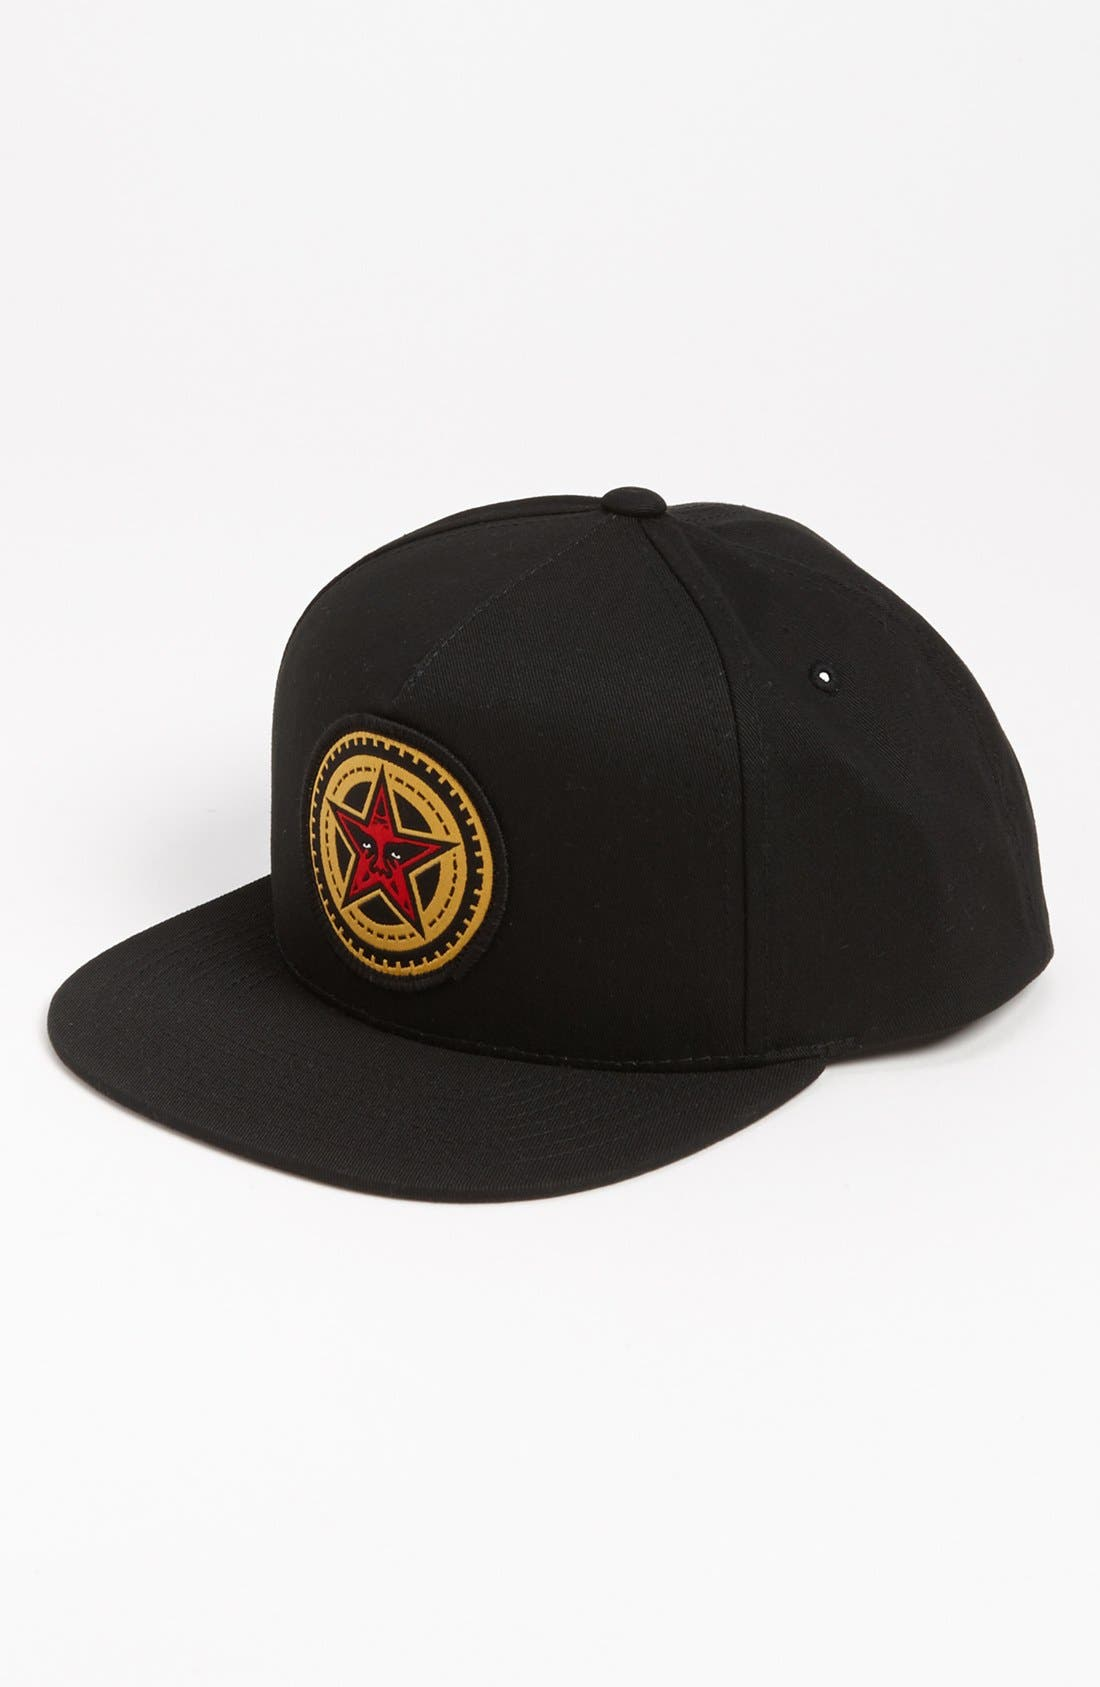 Alternate Image 1 Selected - Obey 'Gears' Snapback Hat